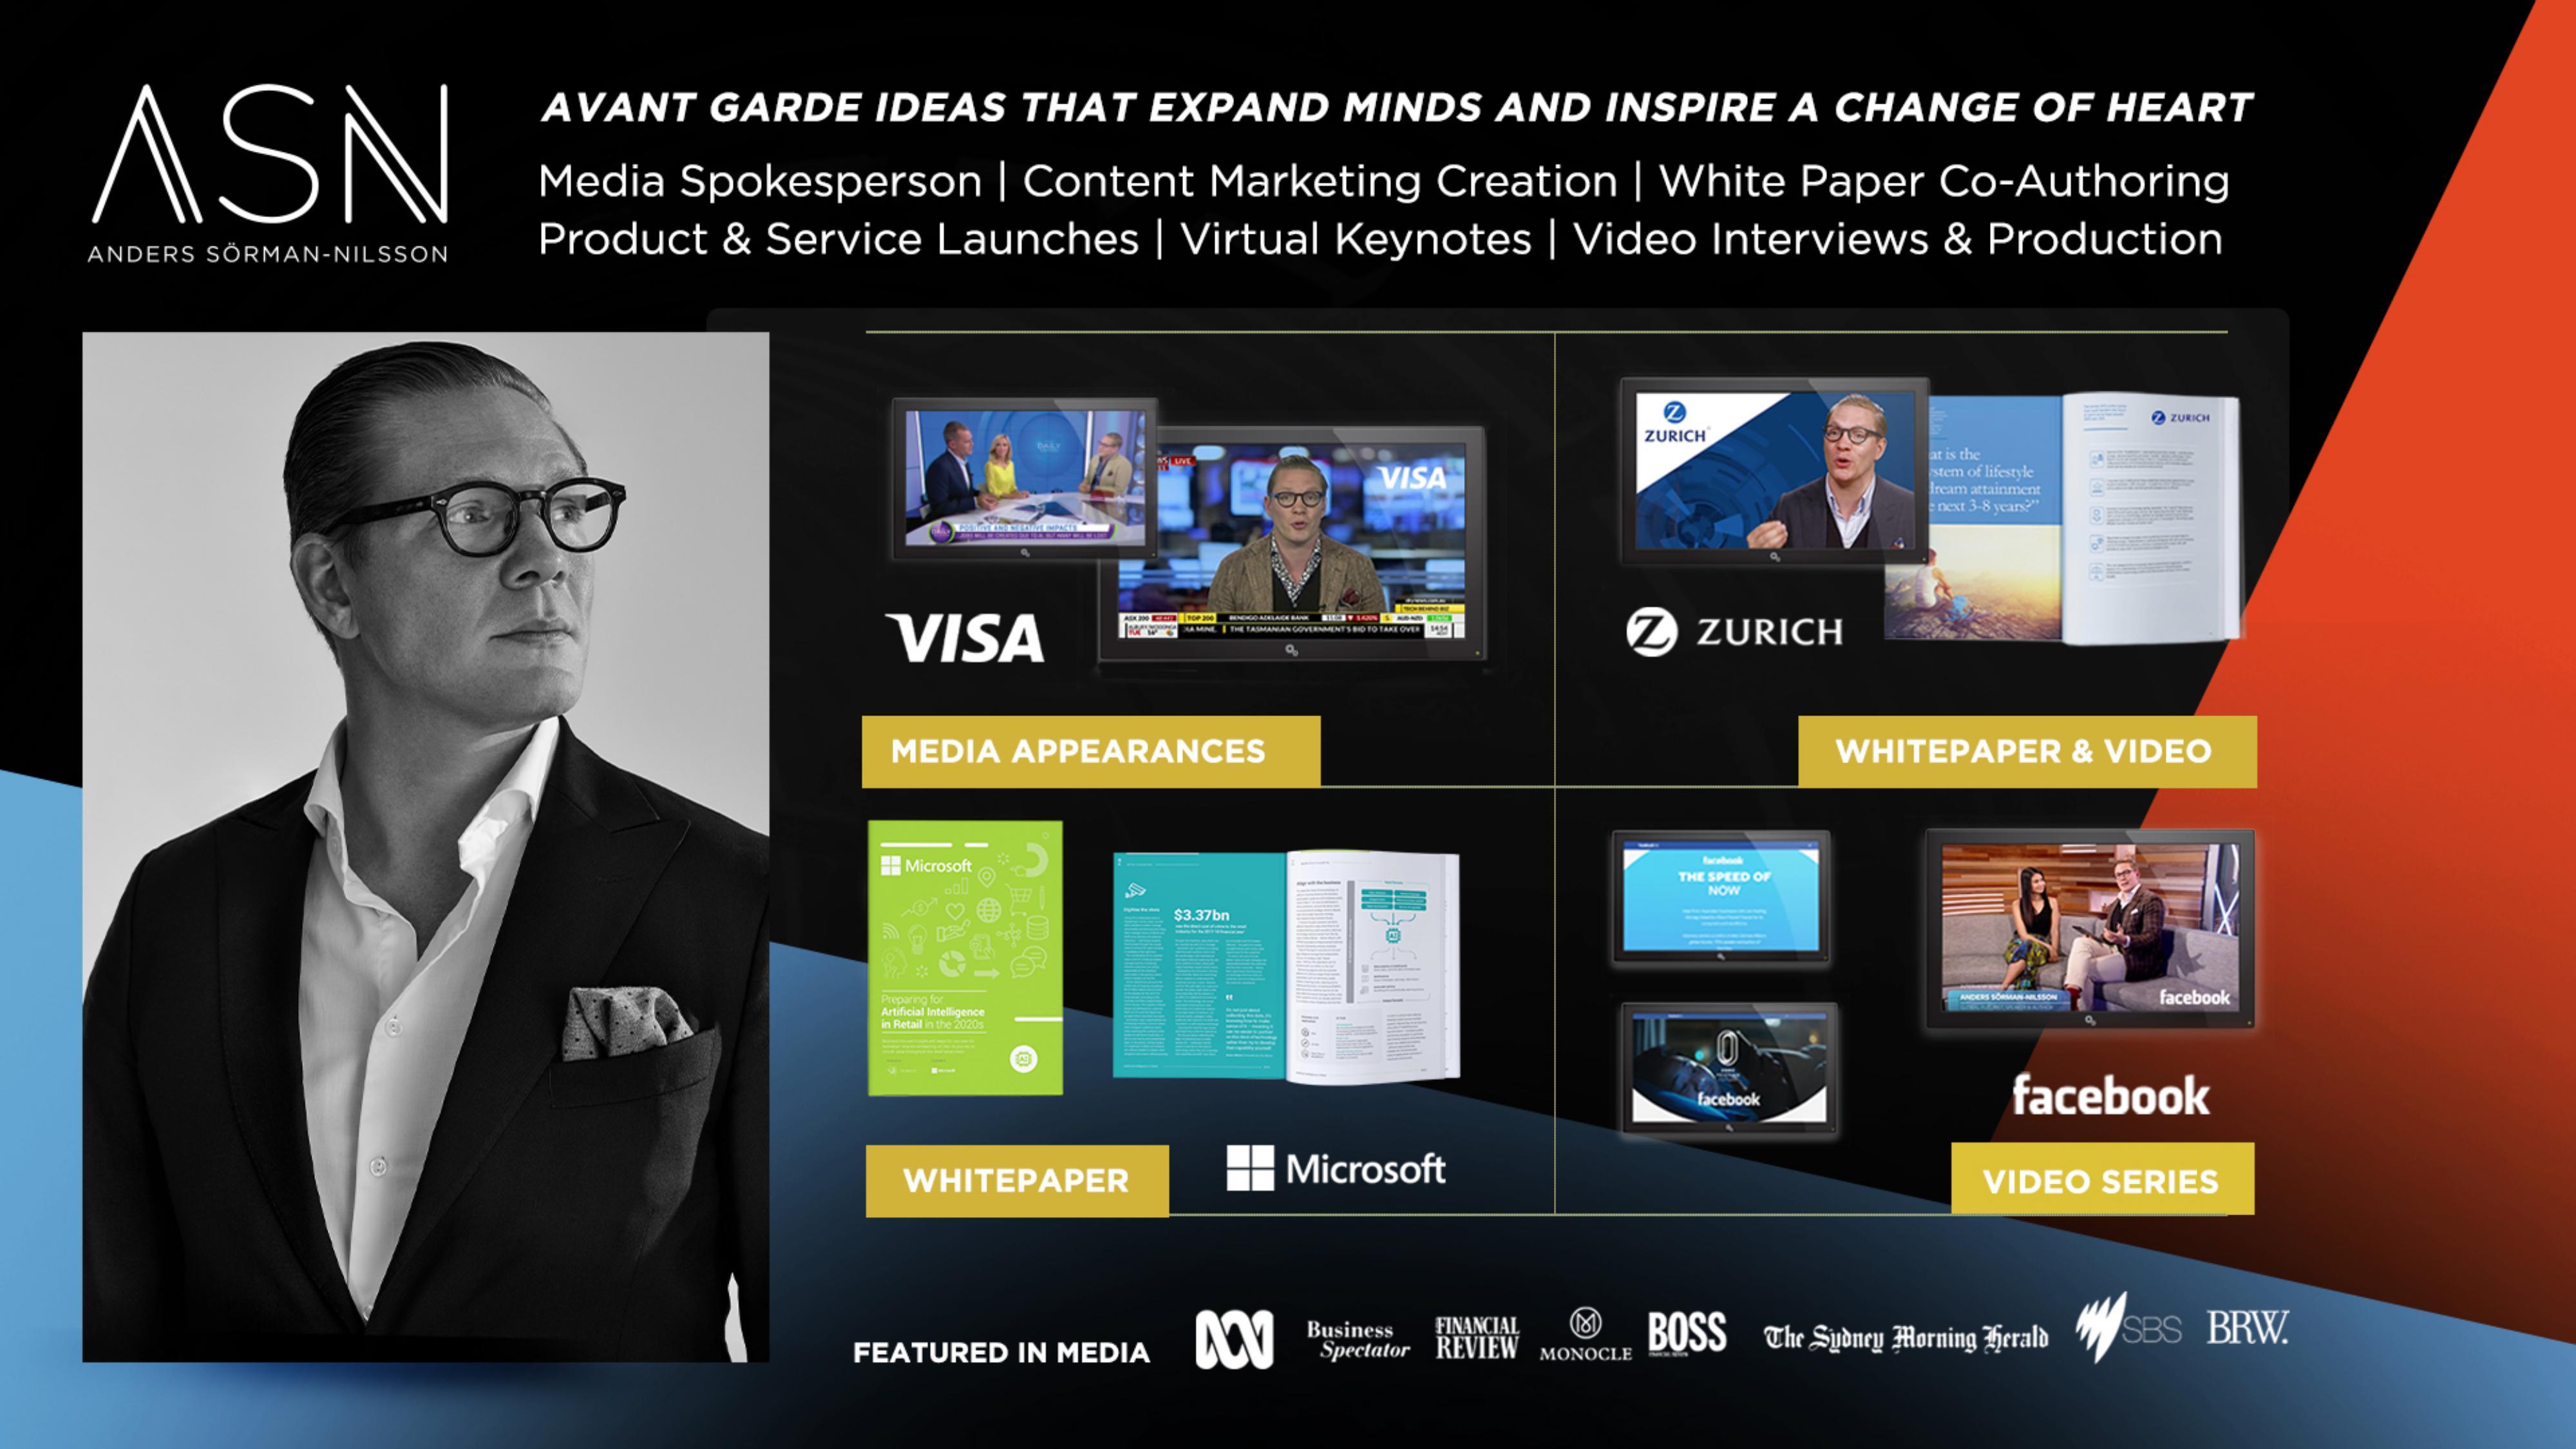 Futurist as Brand Ambassador Anders Sorman-Nilsson